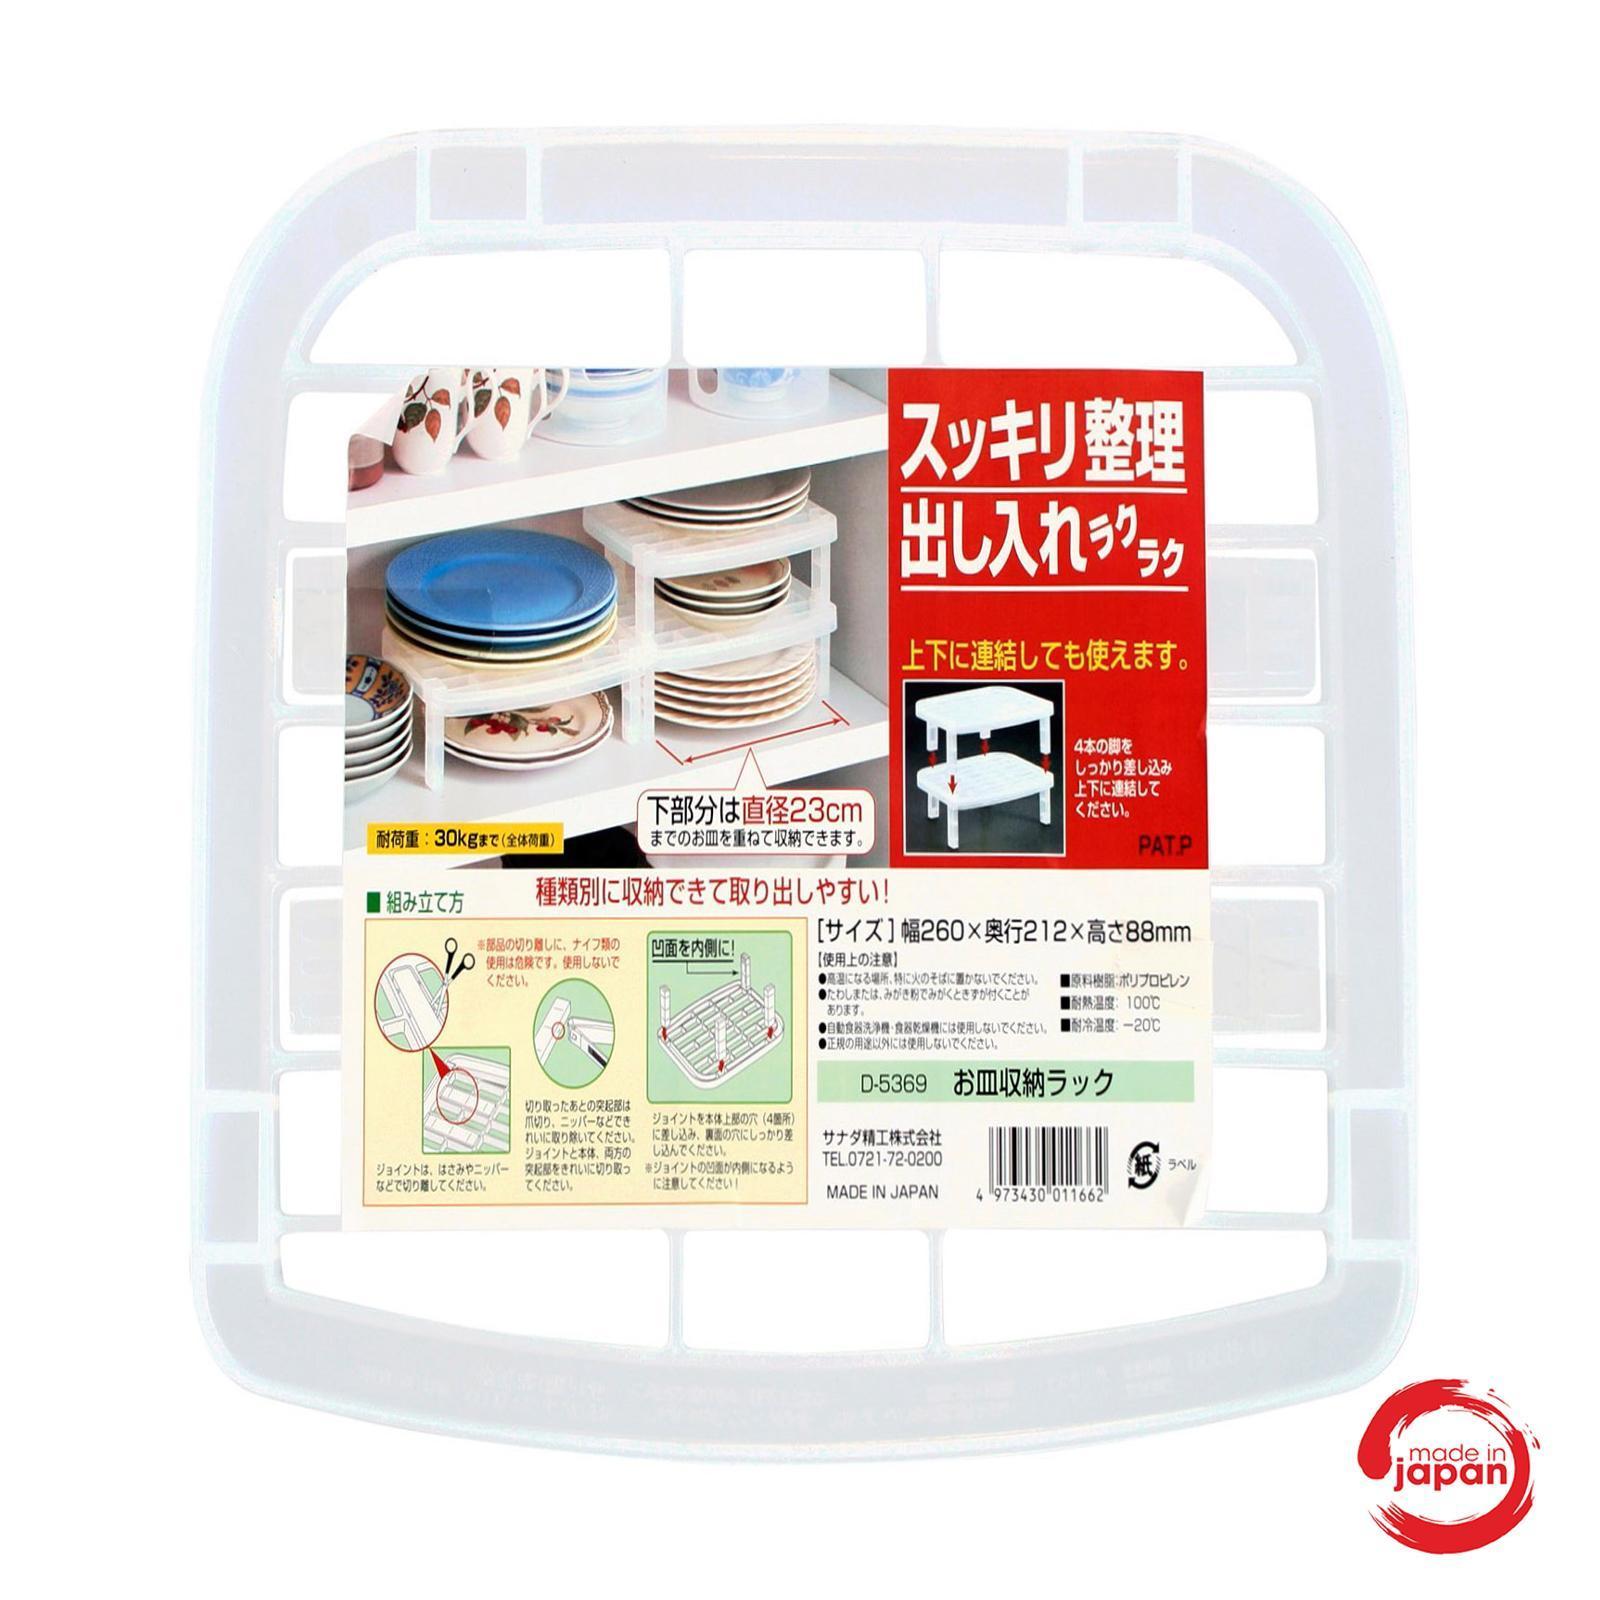 Nomi - Kitchen - Dish Rack